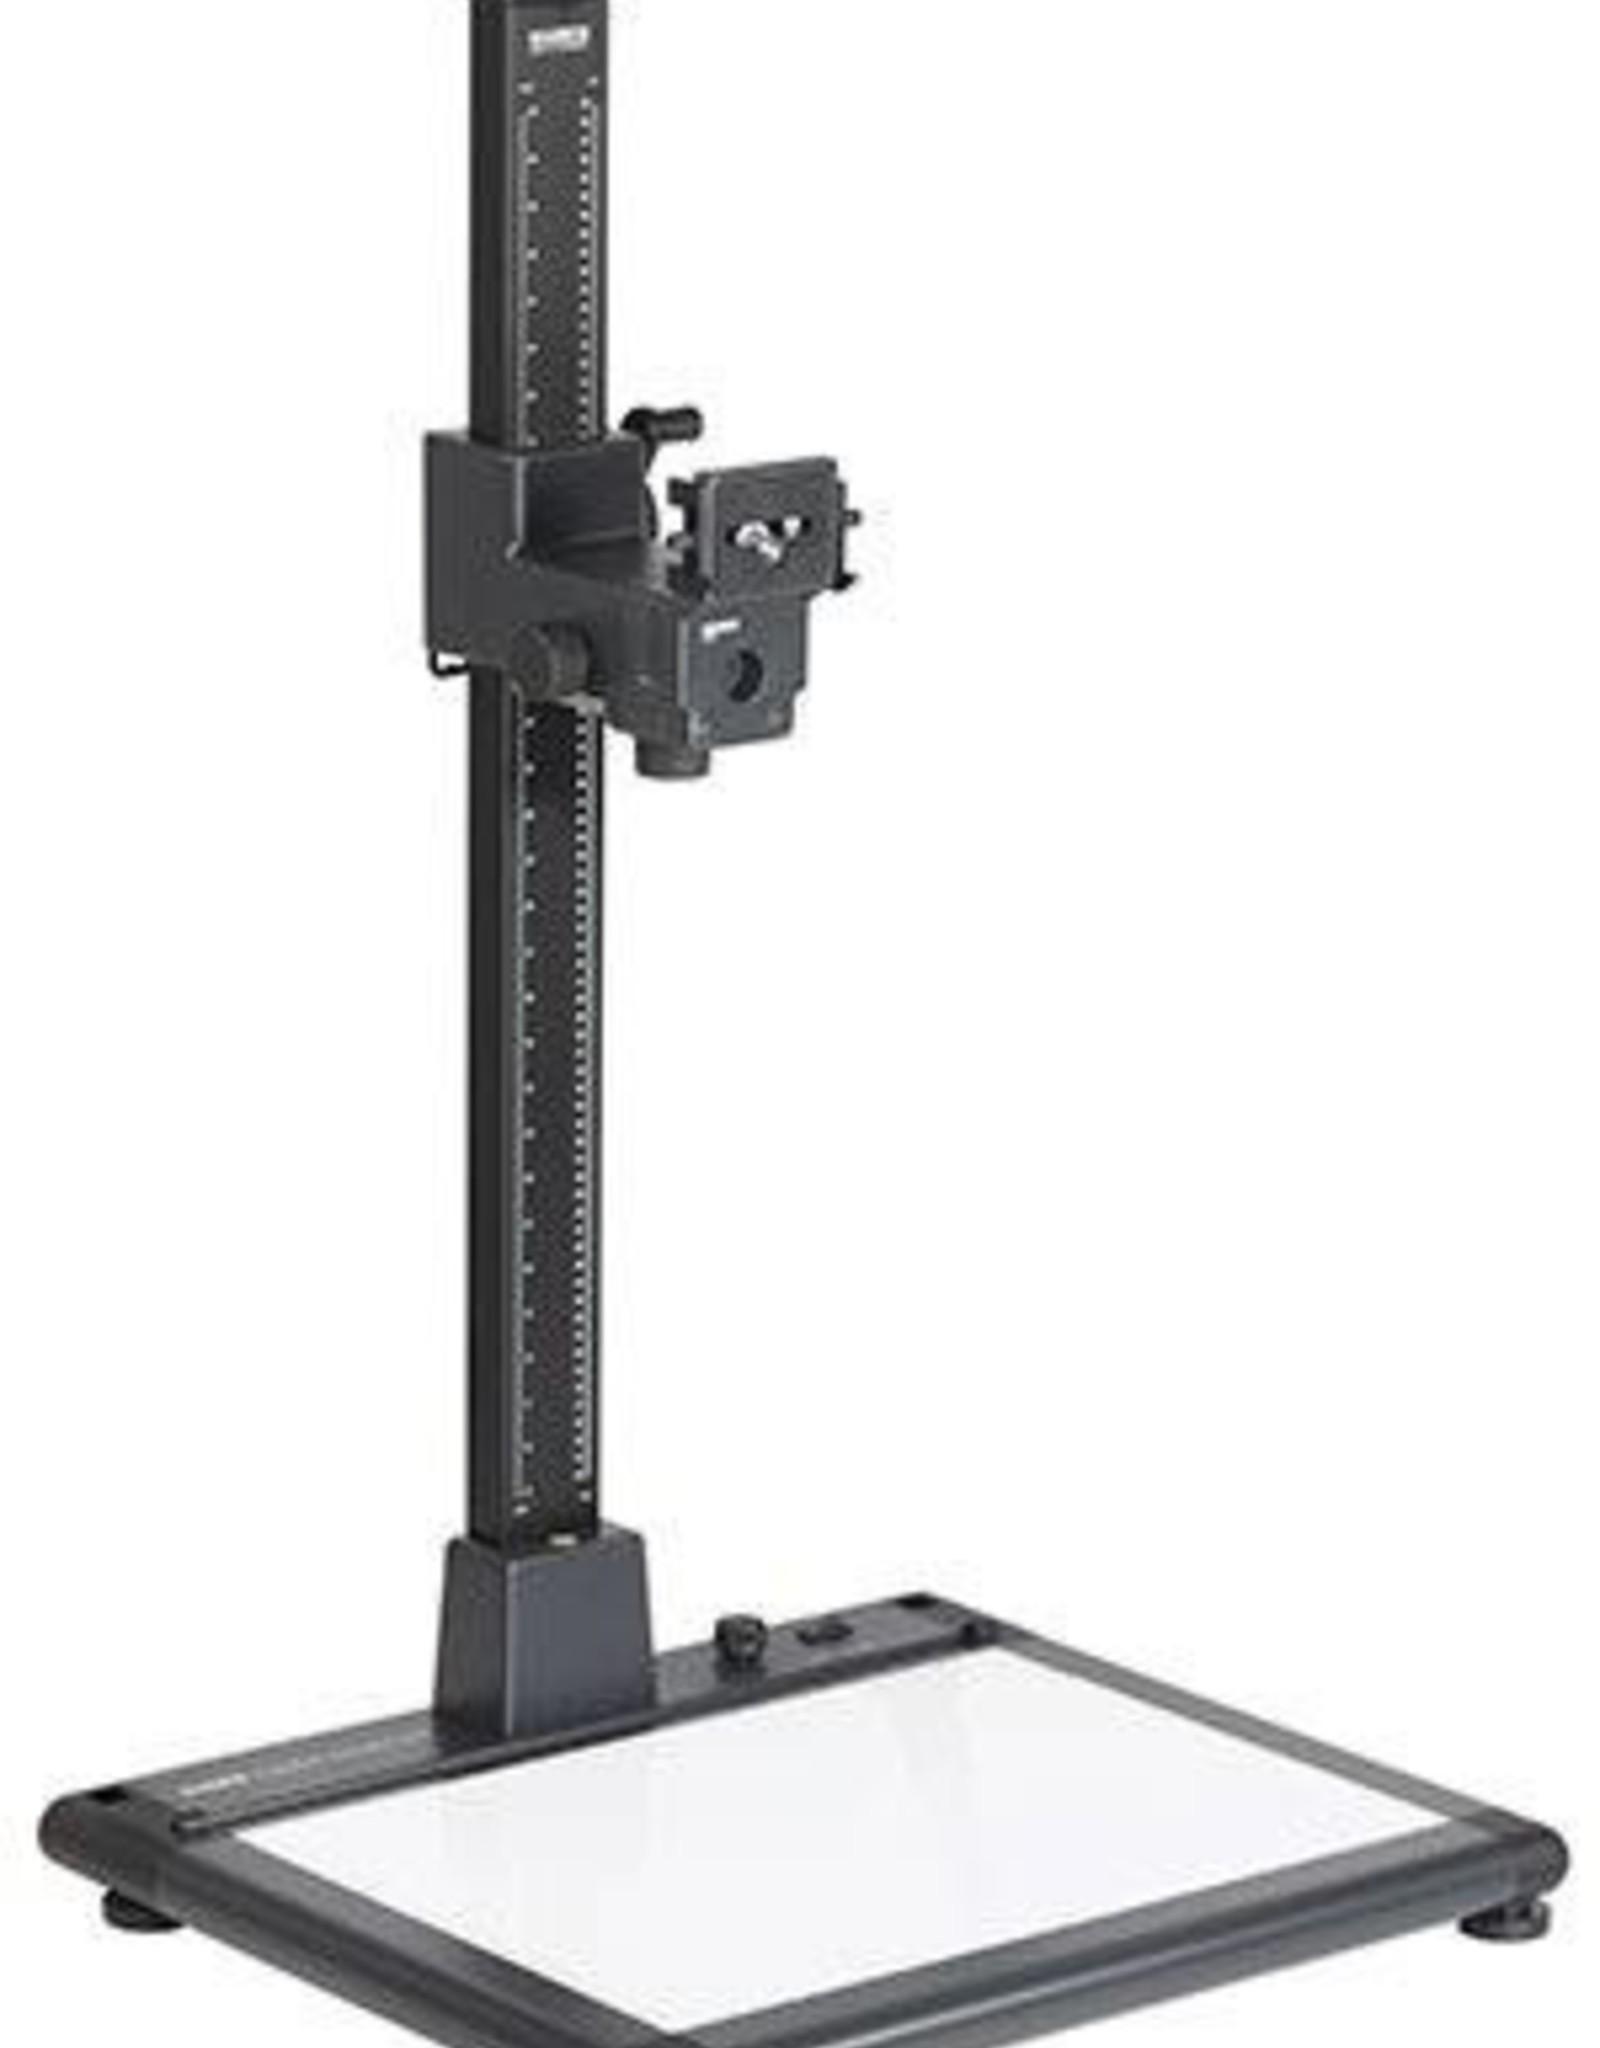 Kaiser Kaiser Copylizer exe.cutive LED, column 100 cm (39.4 in.), camera arm RTP and illumina base plate, area 50.6 x 36 cm (19.9x14.2 in), with 270 SMD LEDs, 5600 K, CRI=95, dimmable 100 - 120 V / 60 Hz, US-Plug